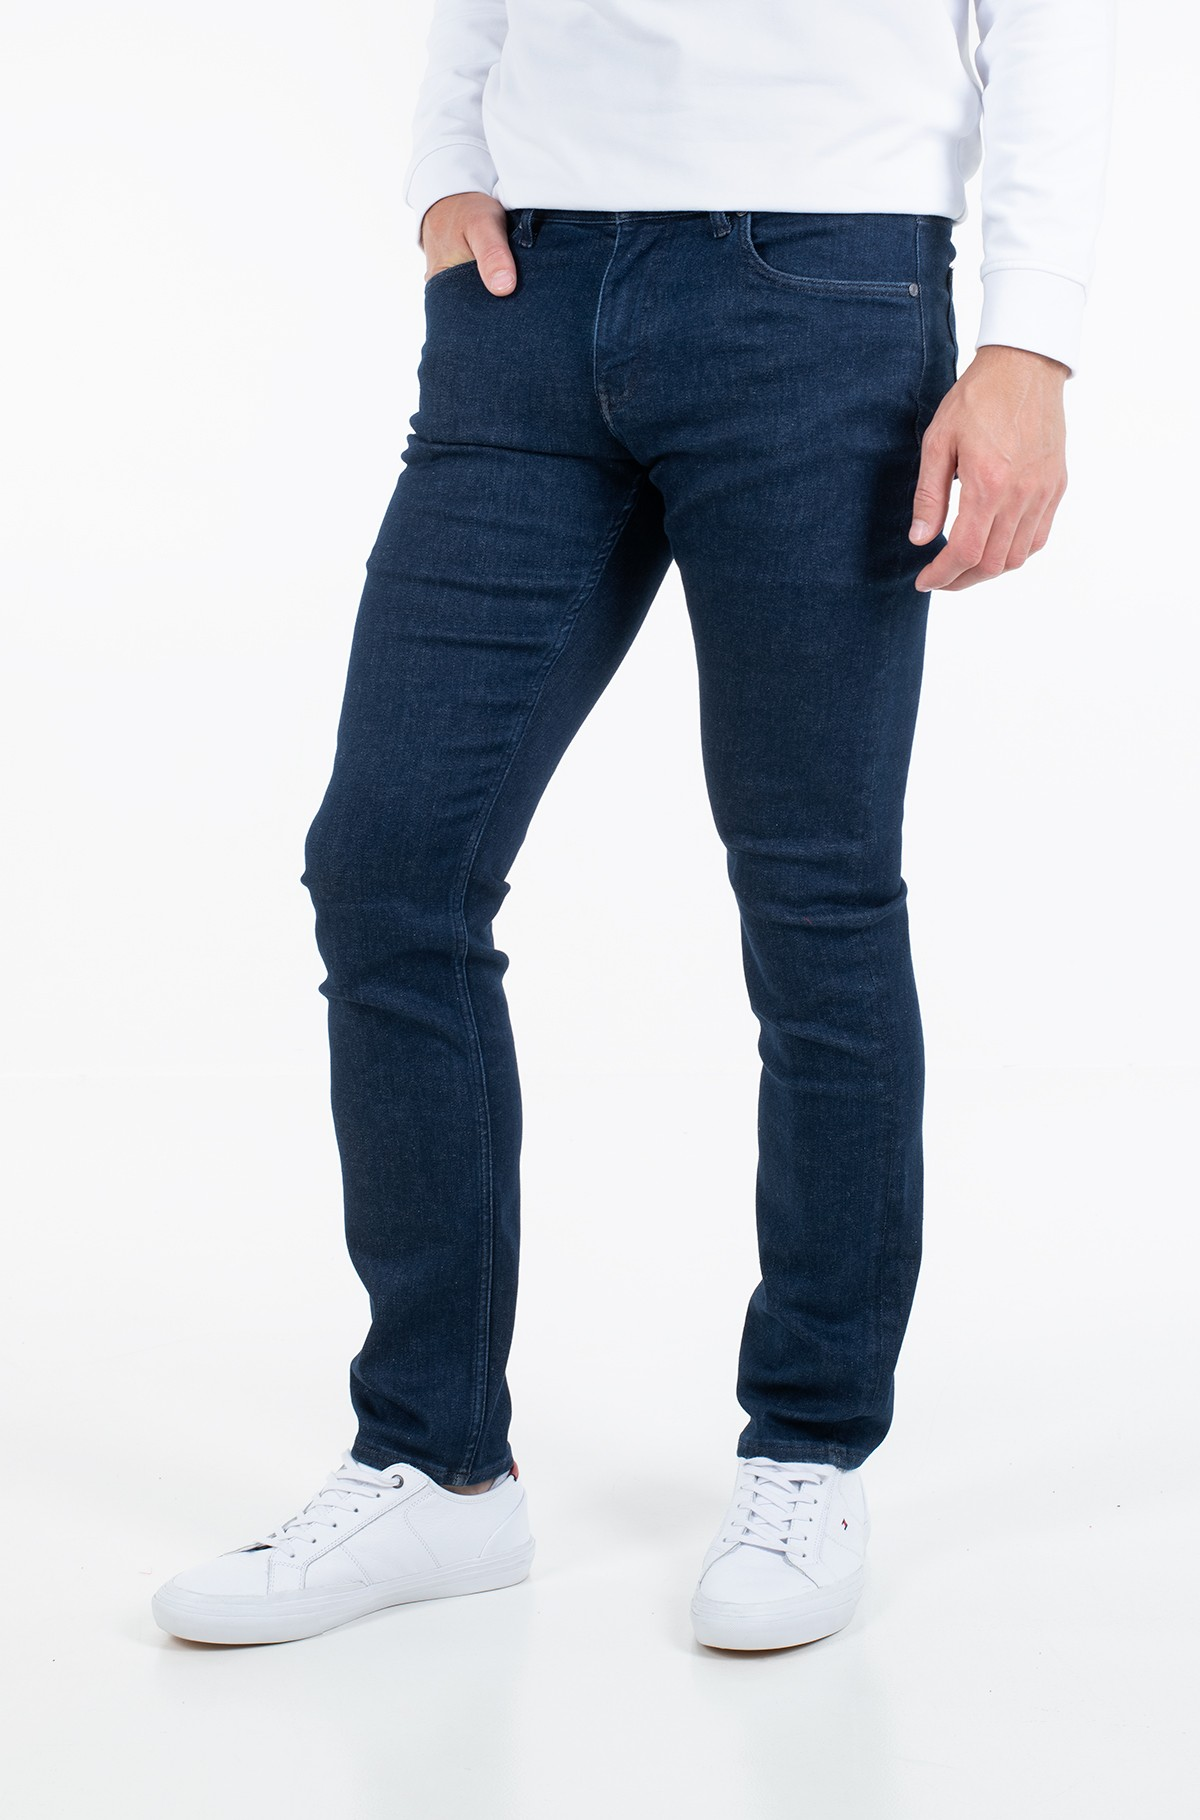 Jeans SLIM BLEECKER HSTR SELBY BLUE-full-1